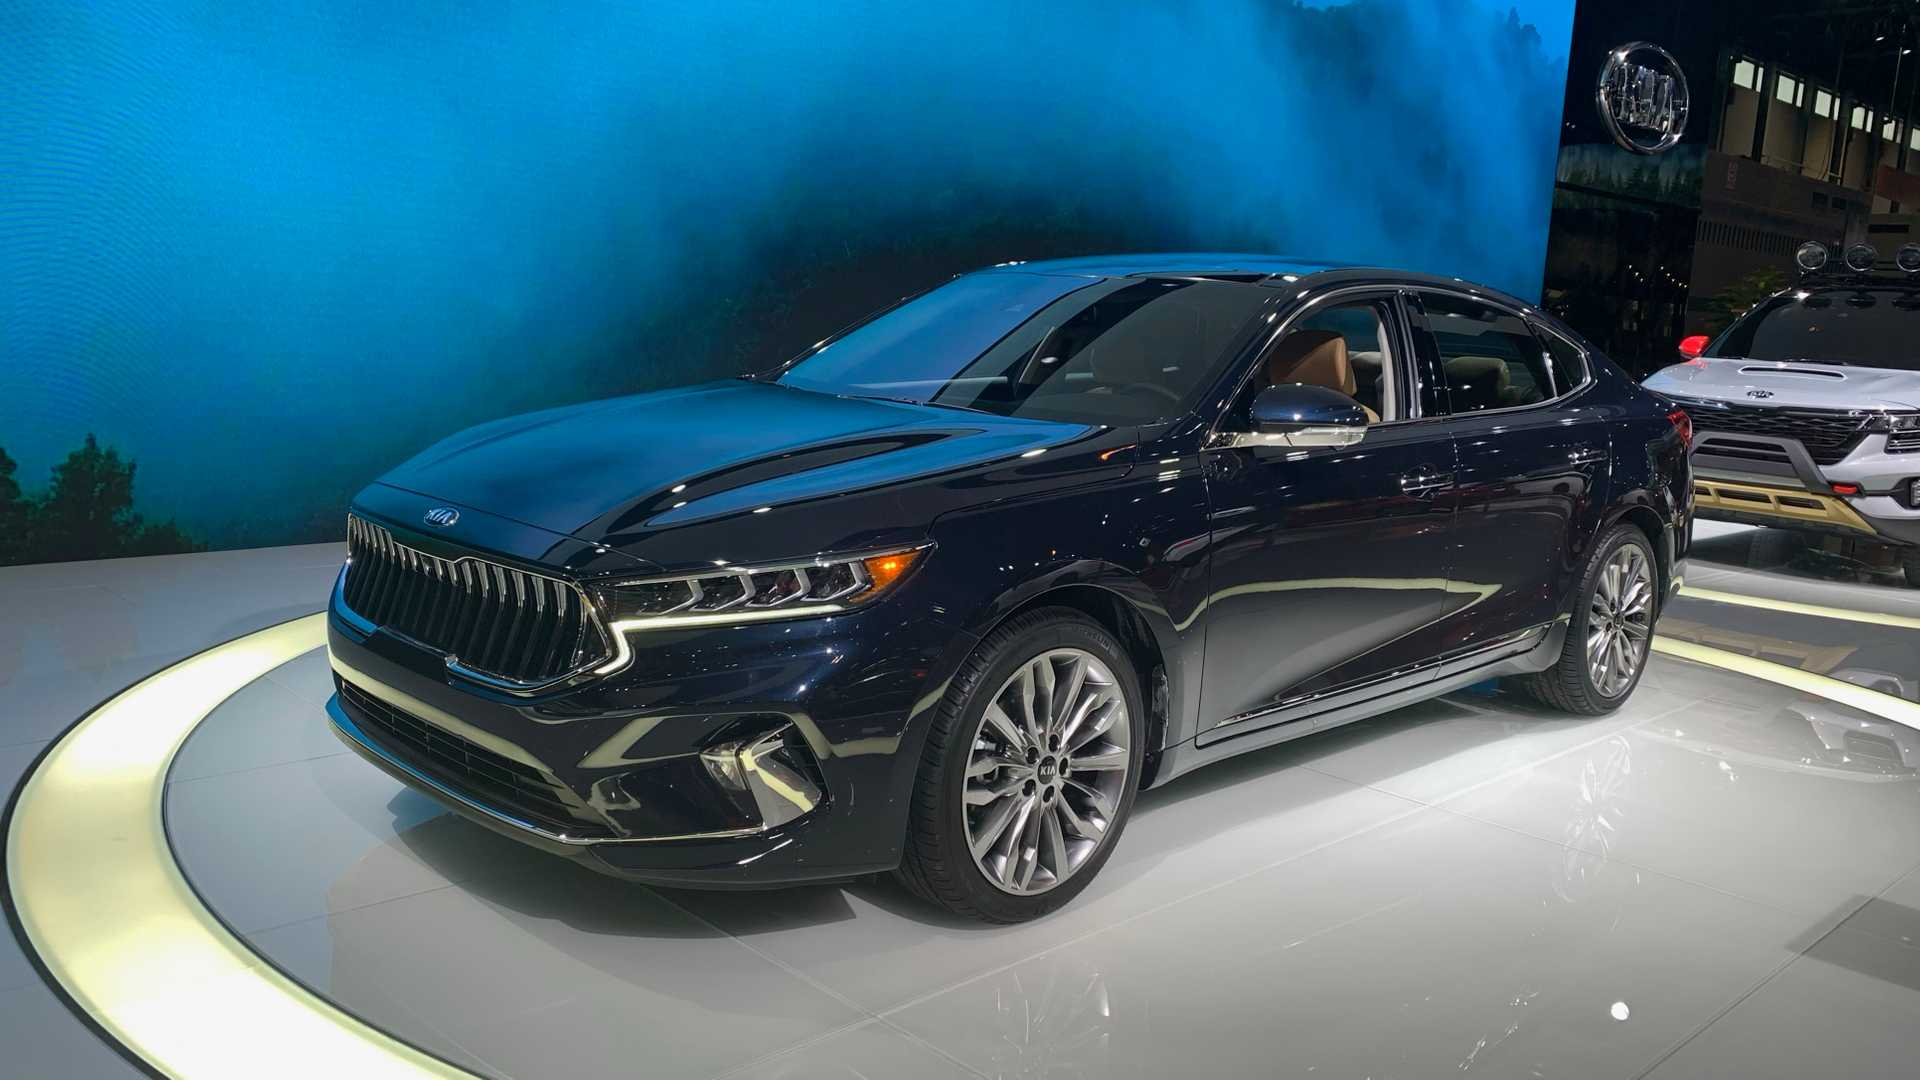 2020 Kia Cadenza Debuts In Chicago With Major Design Changes